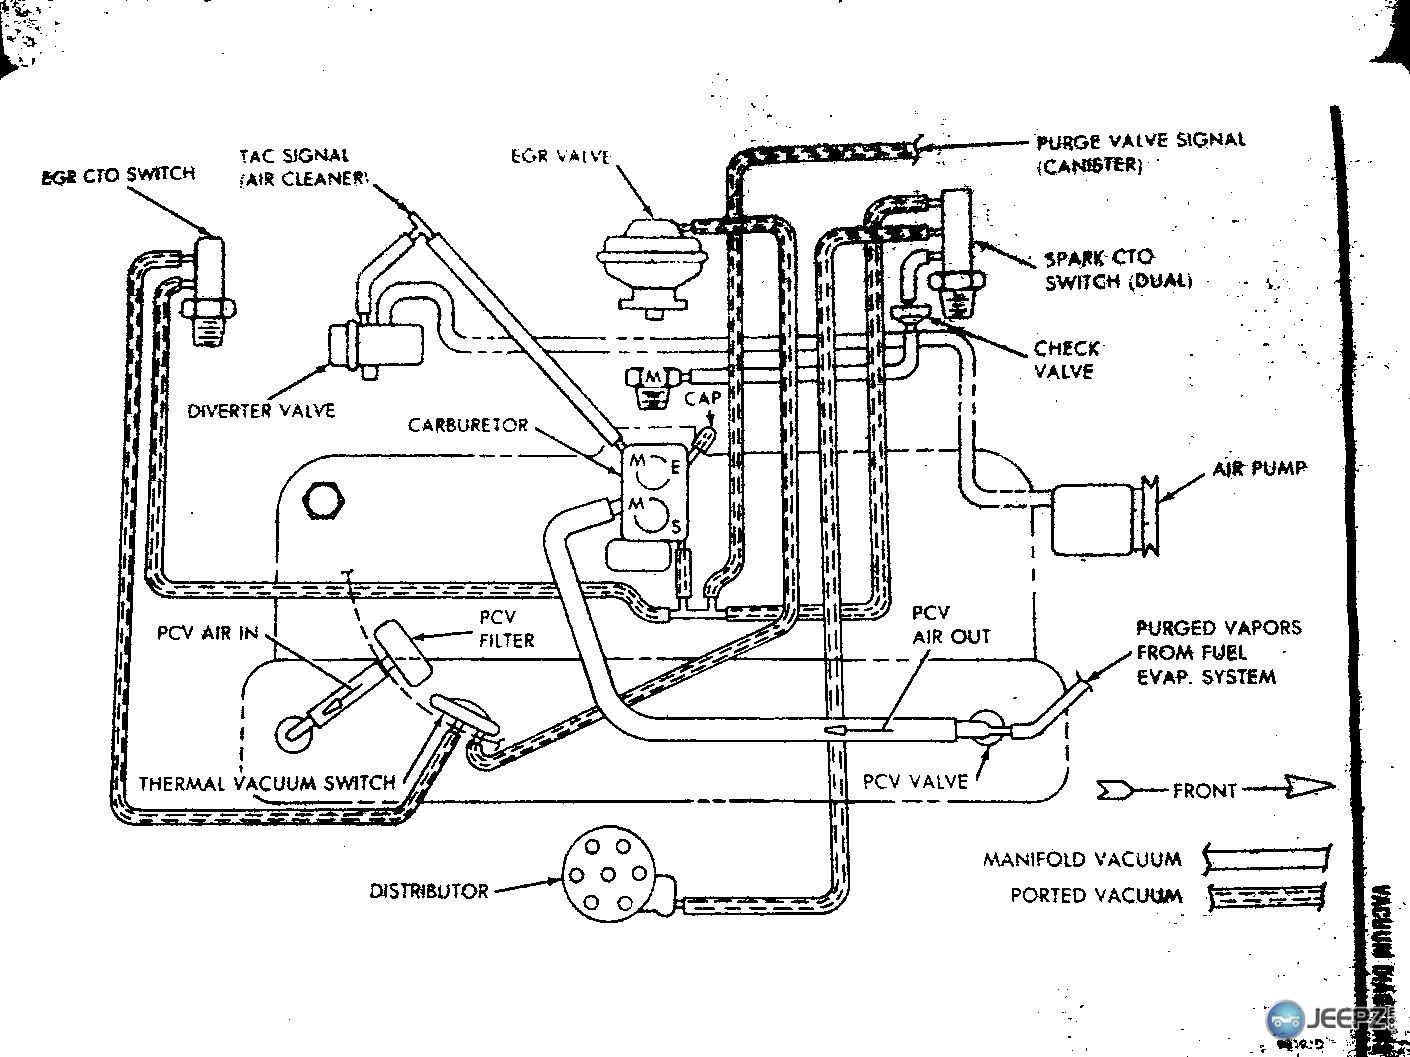 2000 jeep cherokee ignition wiring diagram 1980 kz1000 ltd 1990 vacuum line diagrams schematic xj 1995 yj